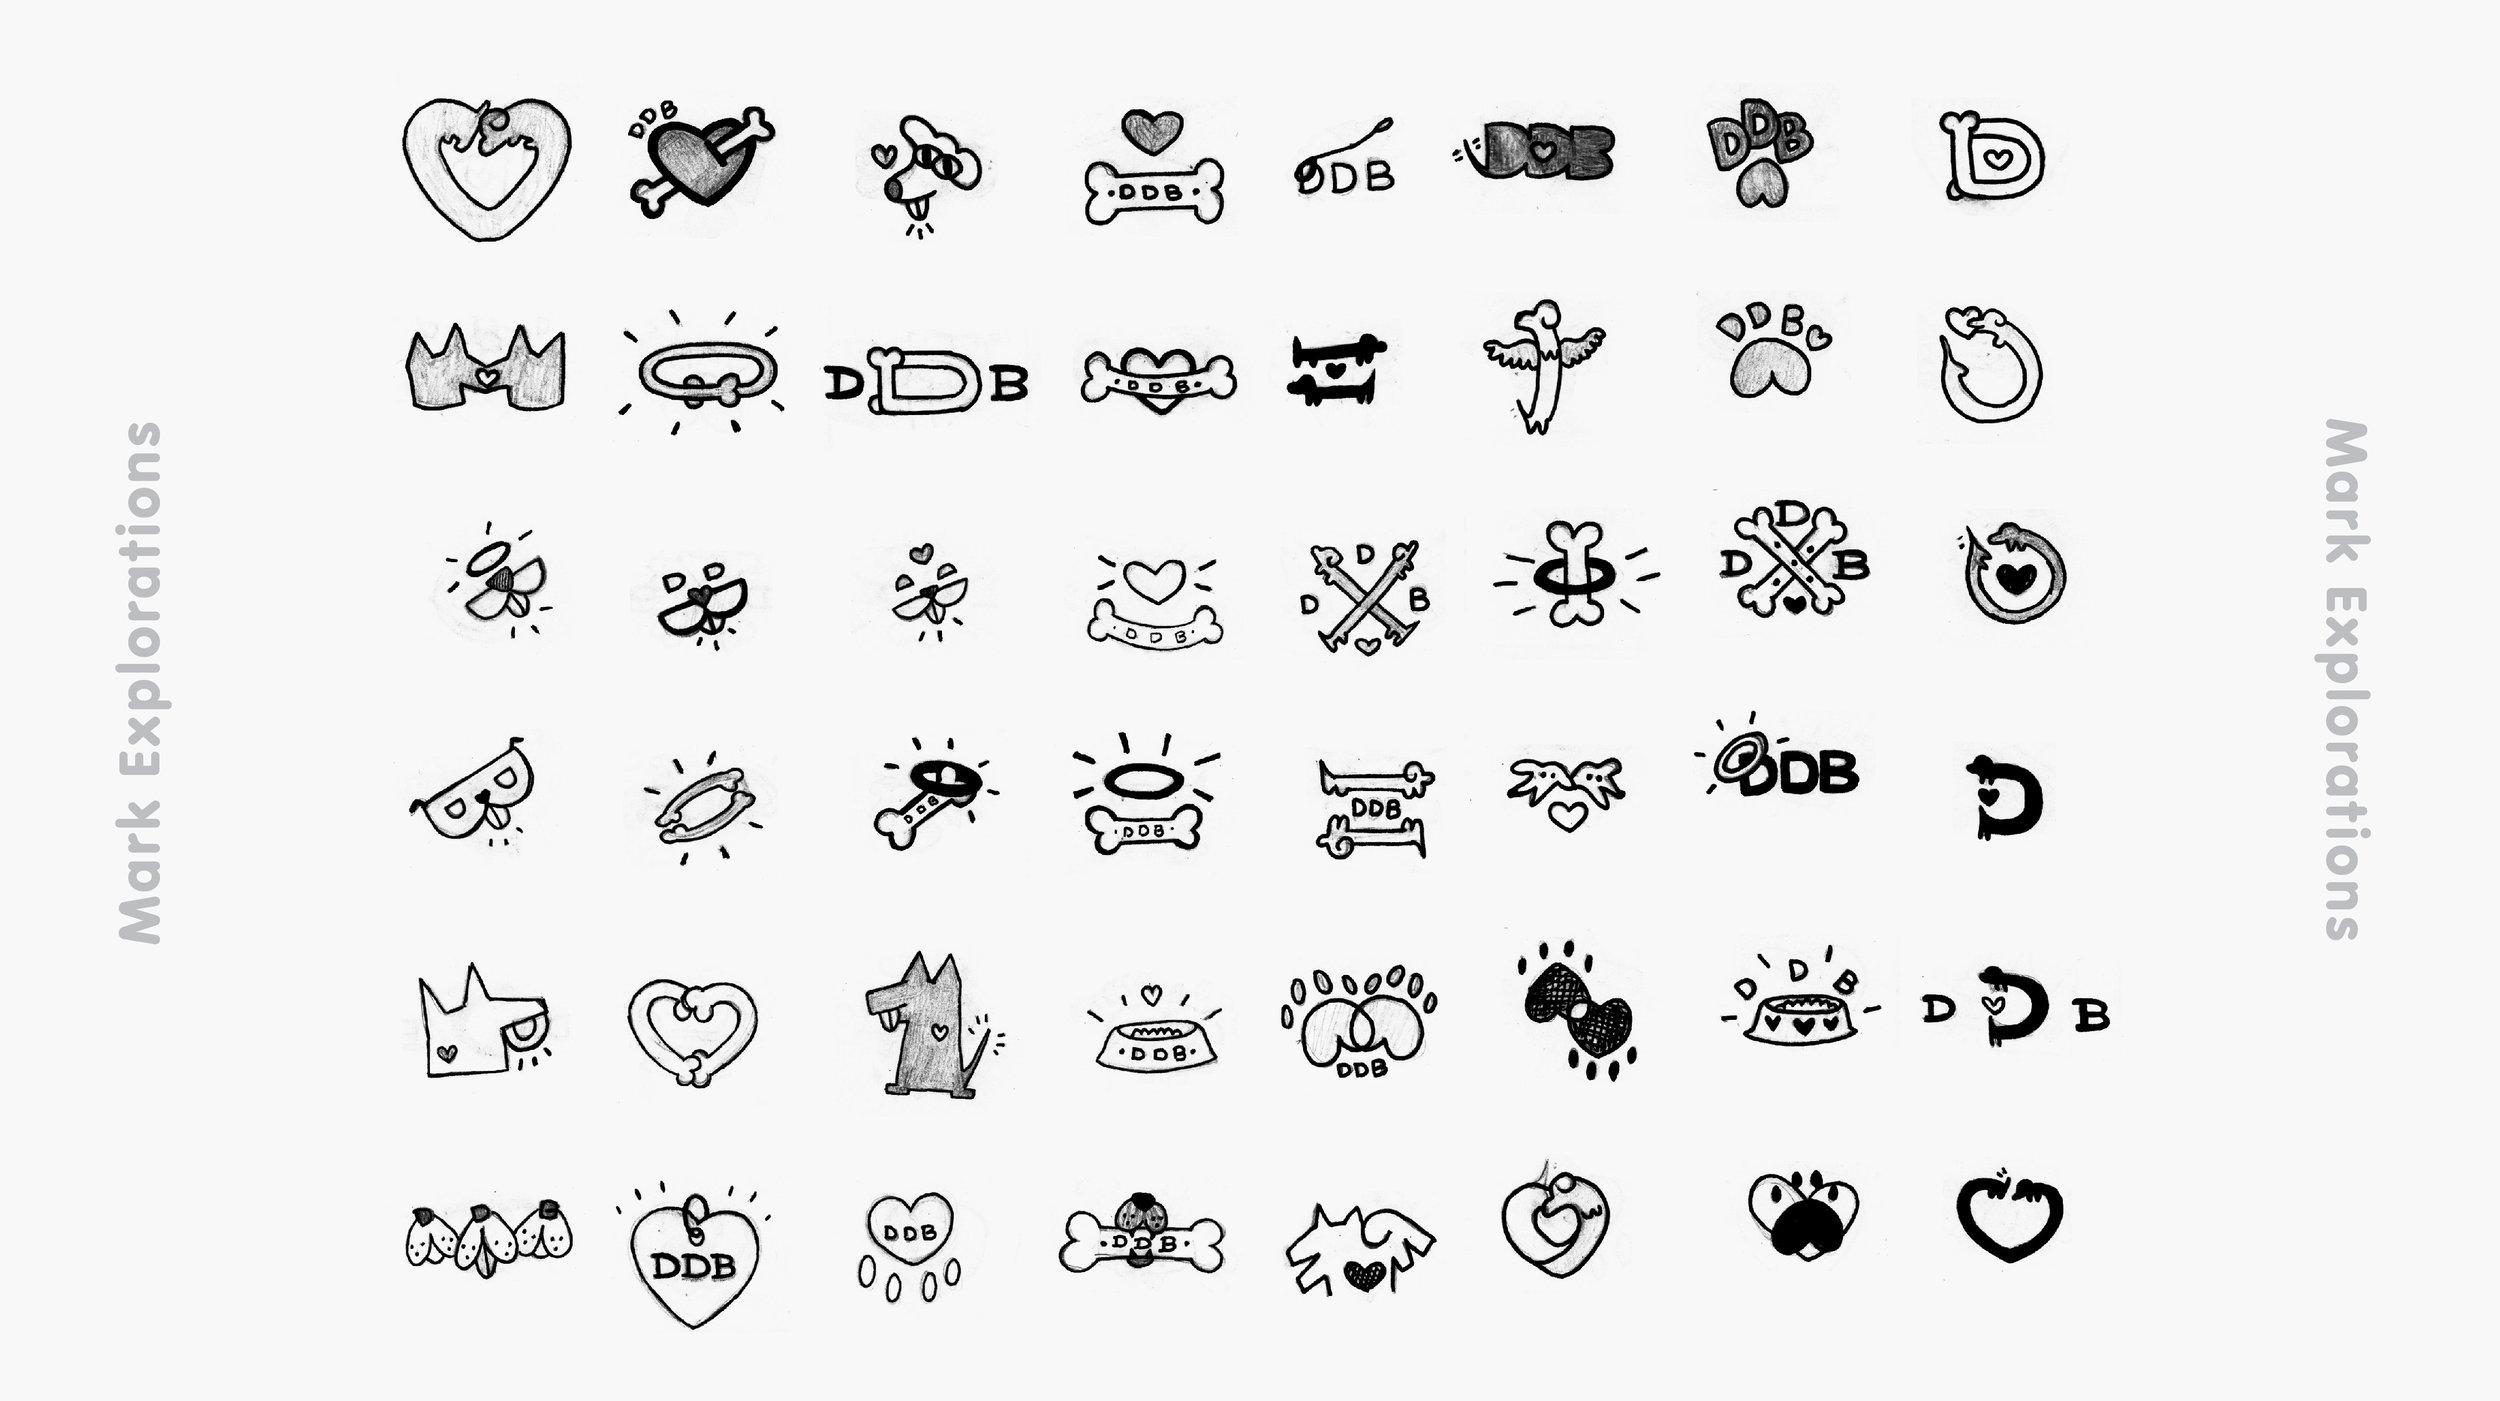 DDB_102_Portfolio Items_2-15.jpg